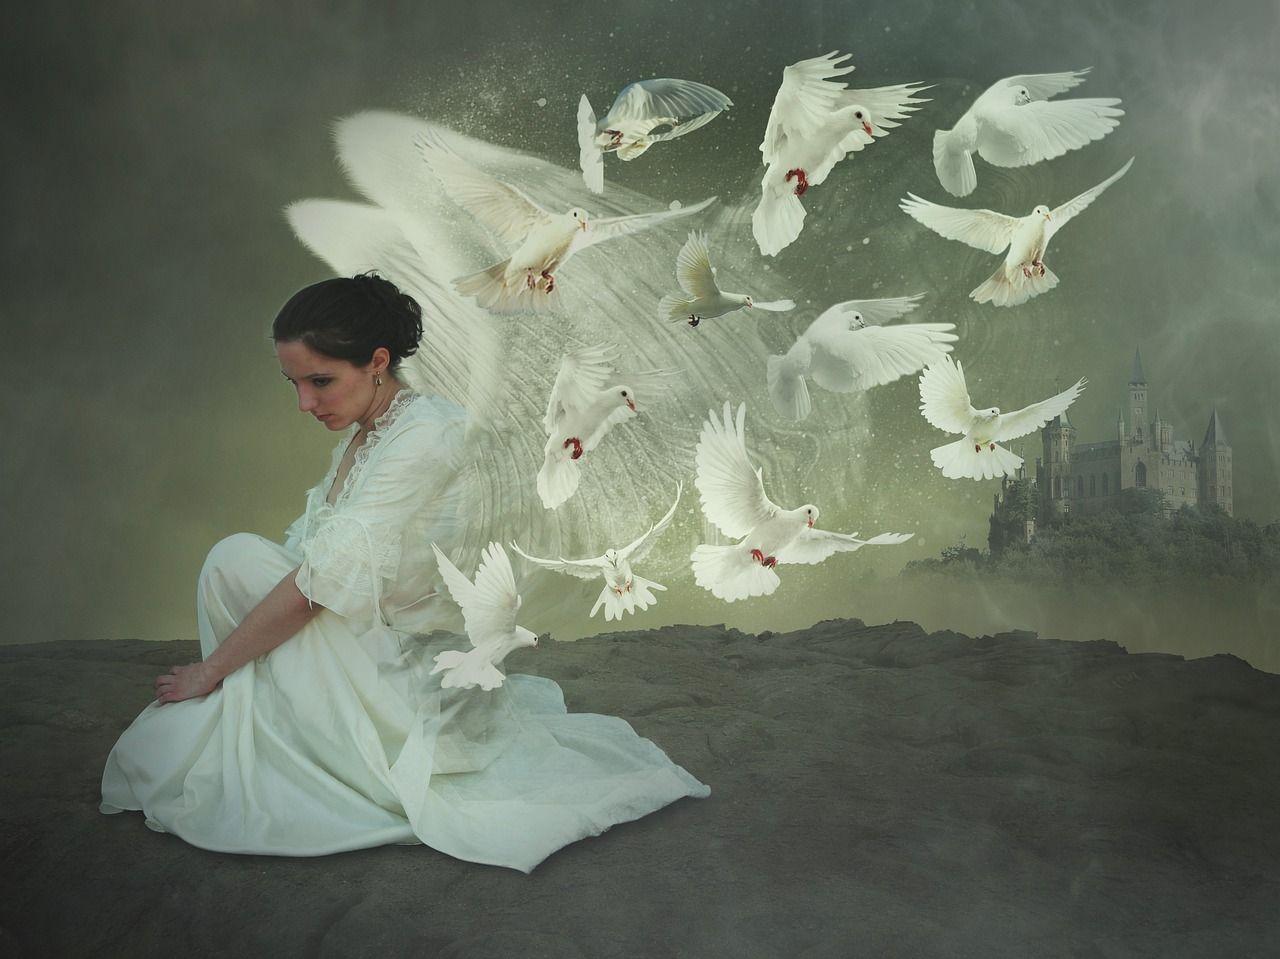 Wing-Angel-Sad-Fee-Woman-Adult-Human-